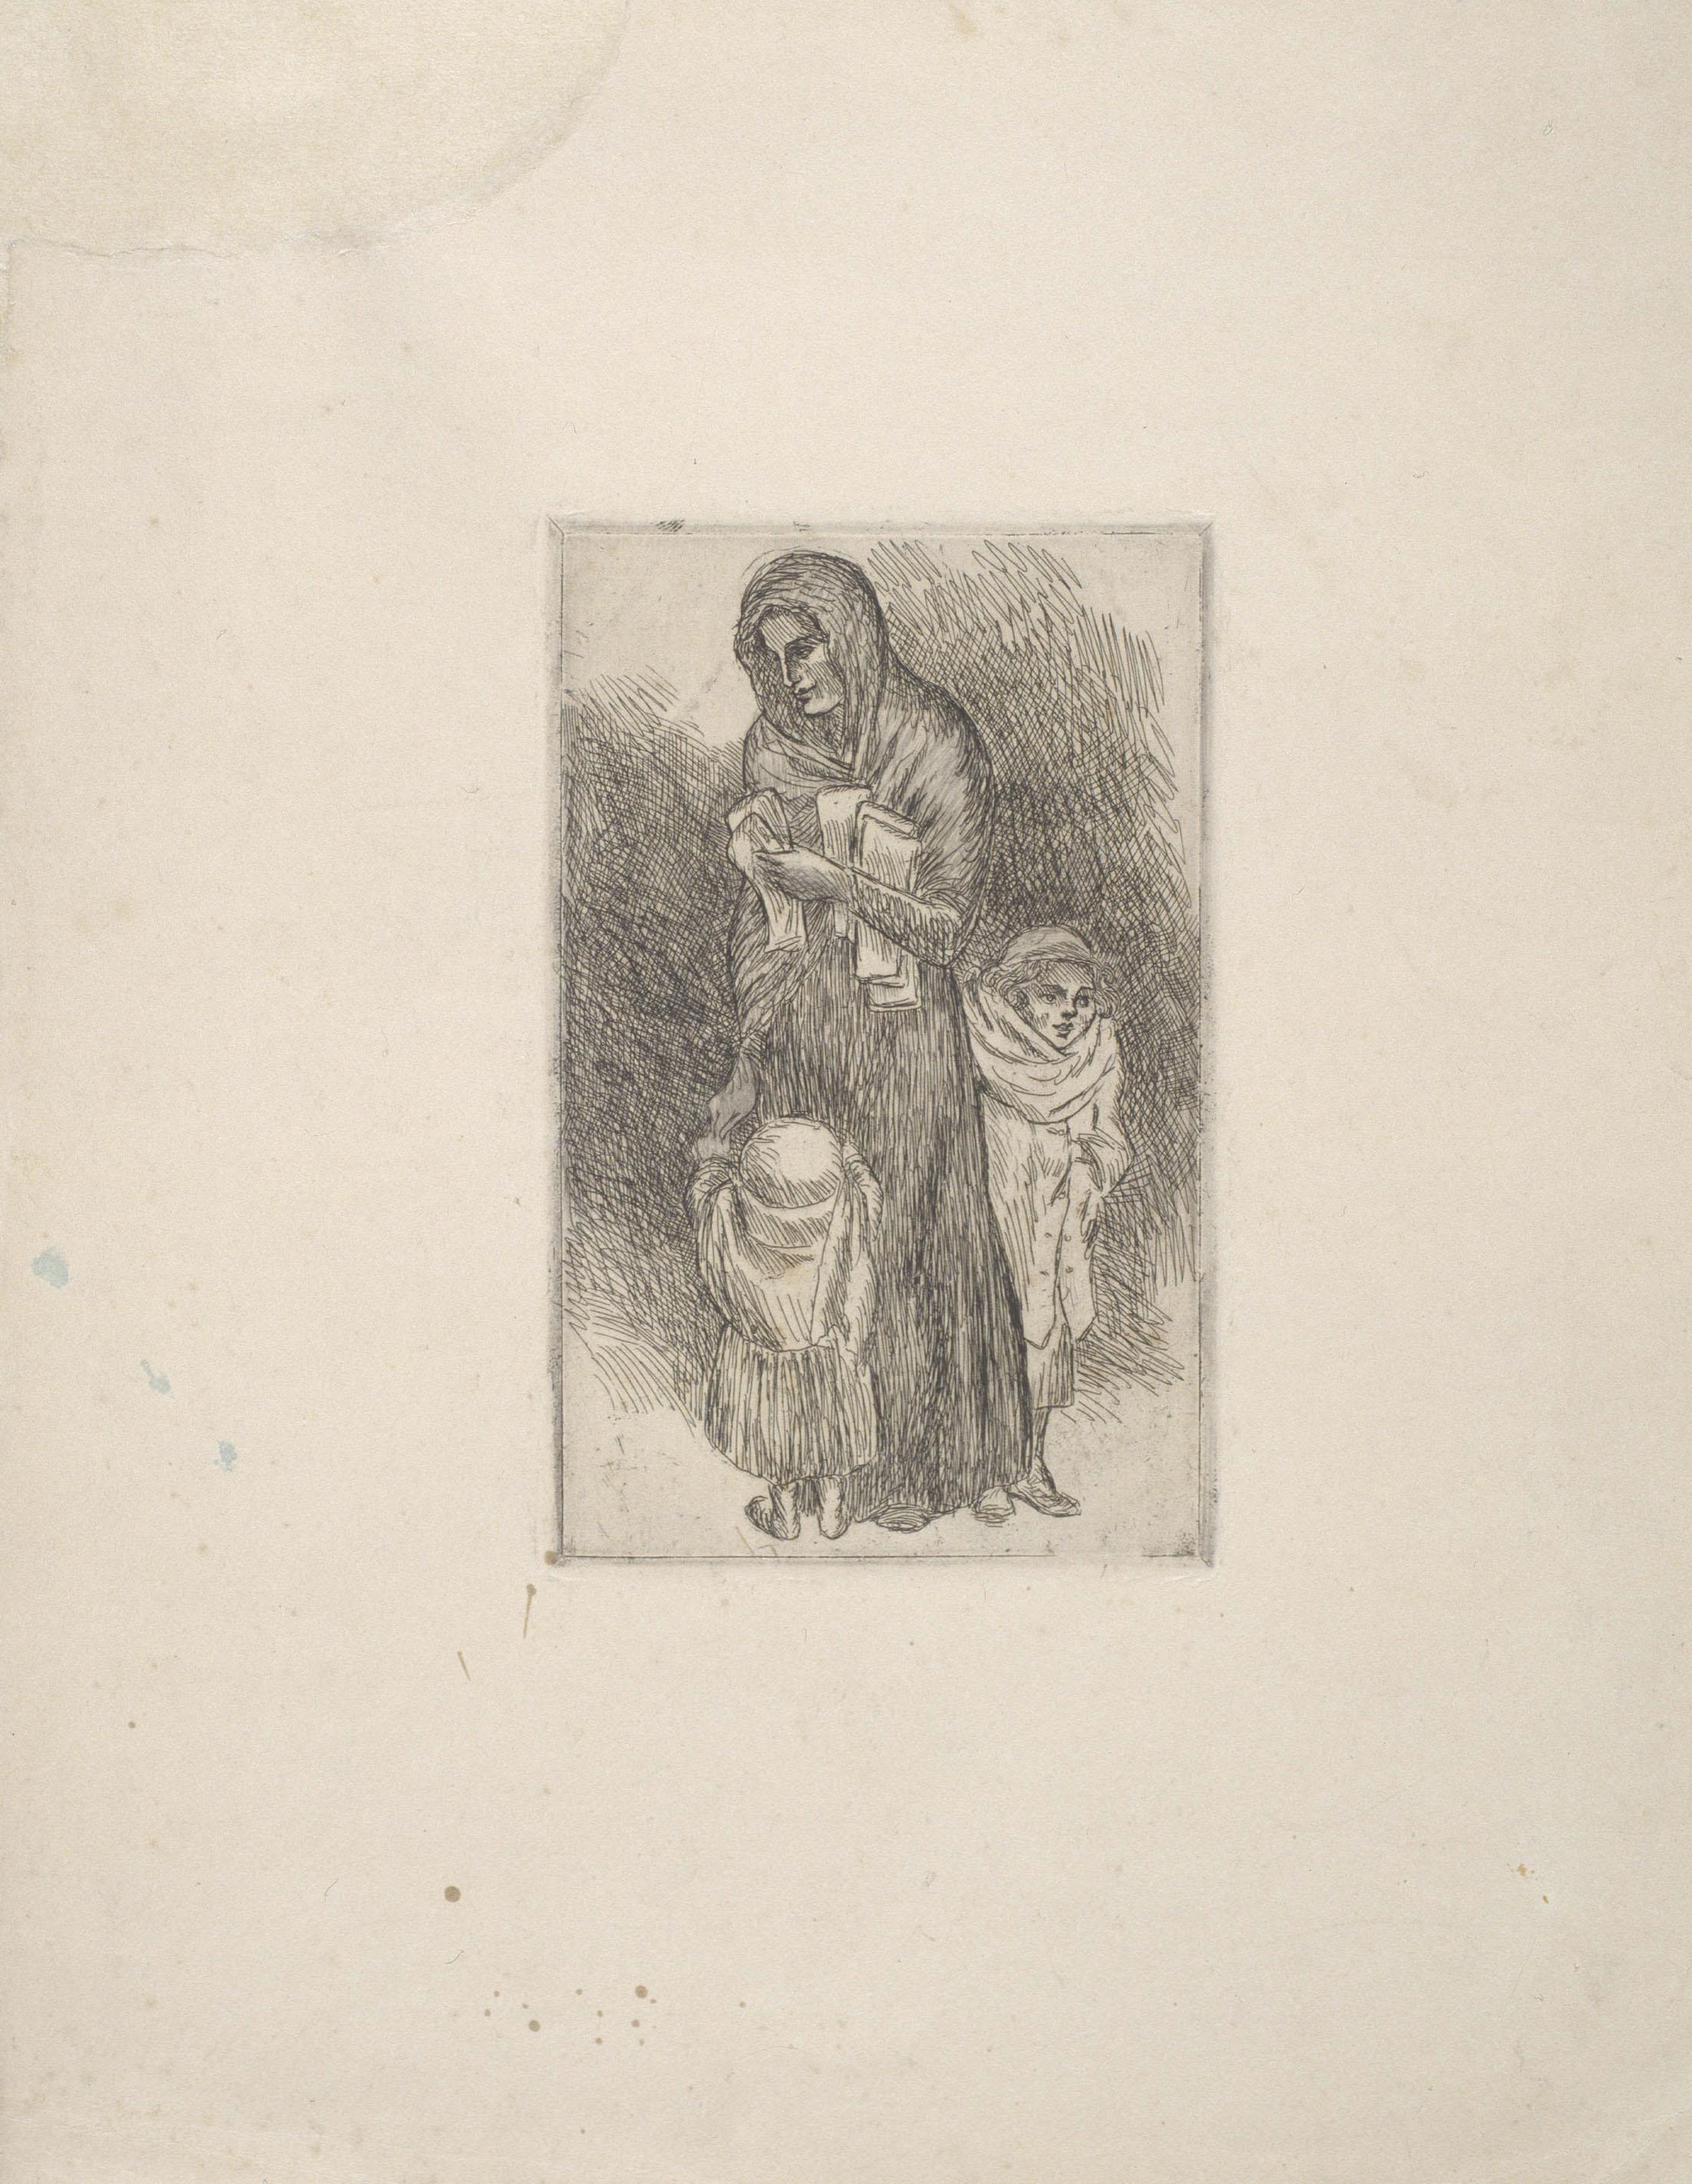 Juli González - Dona amb nens (Femme aux enfants) - Cap a 1904-1910